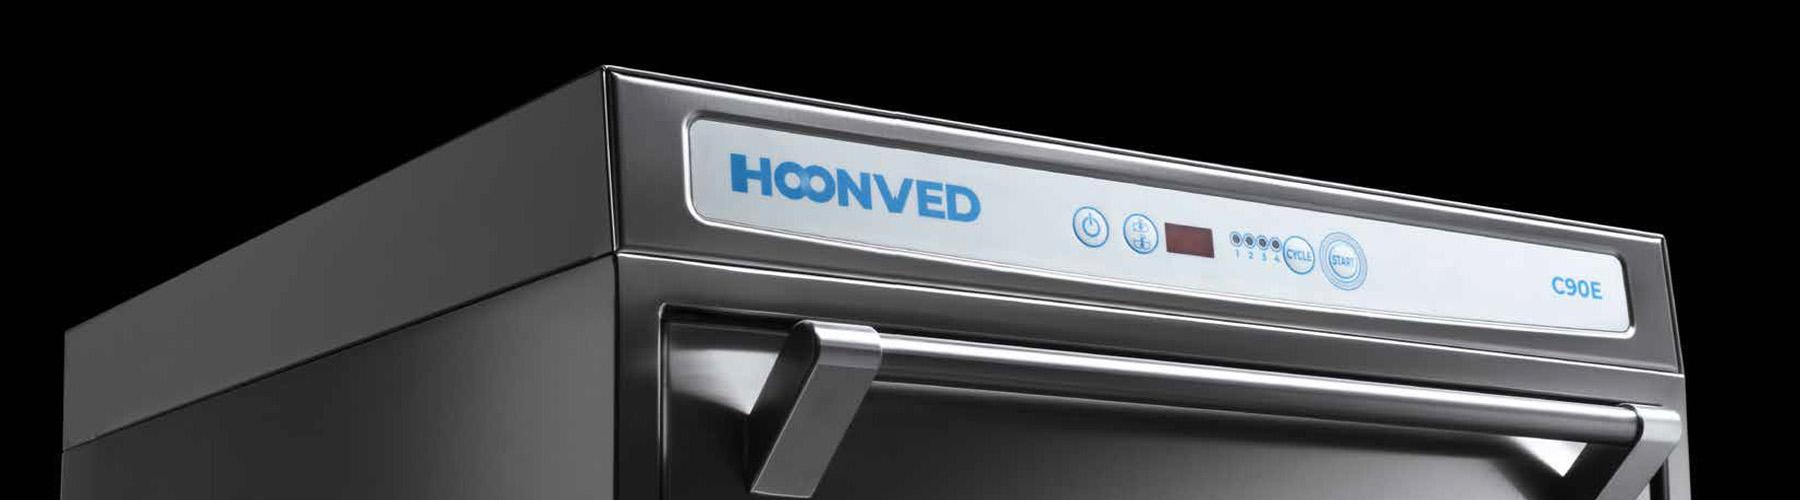 Hoonved-Fanucchi